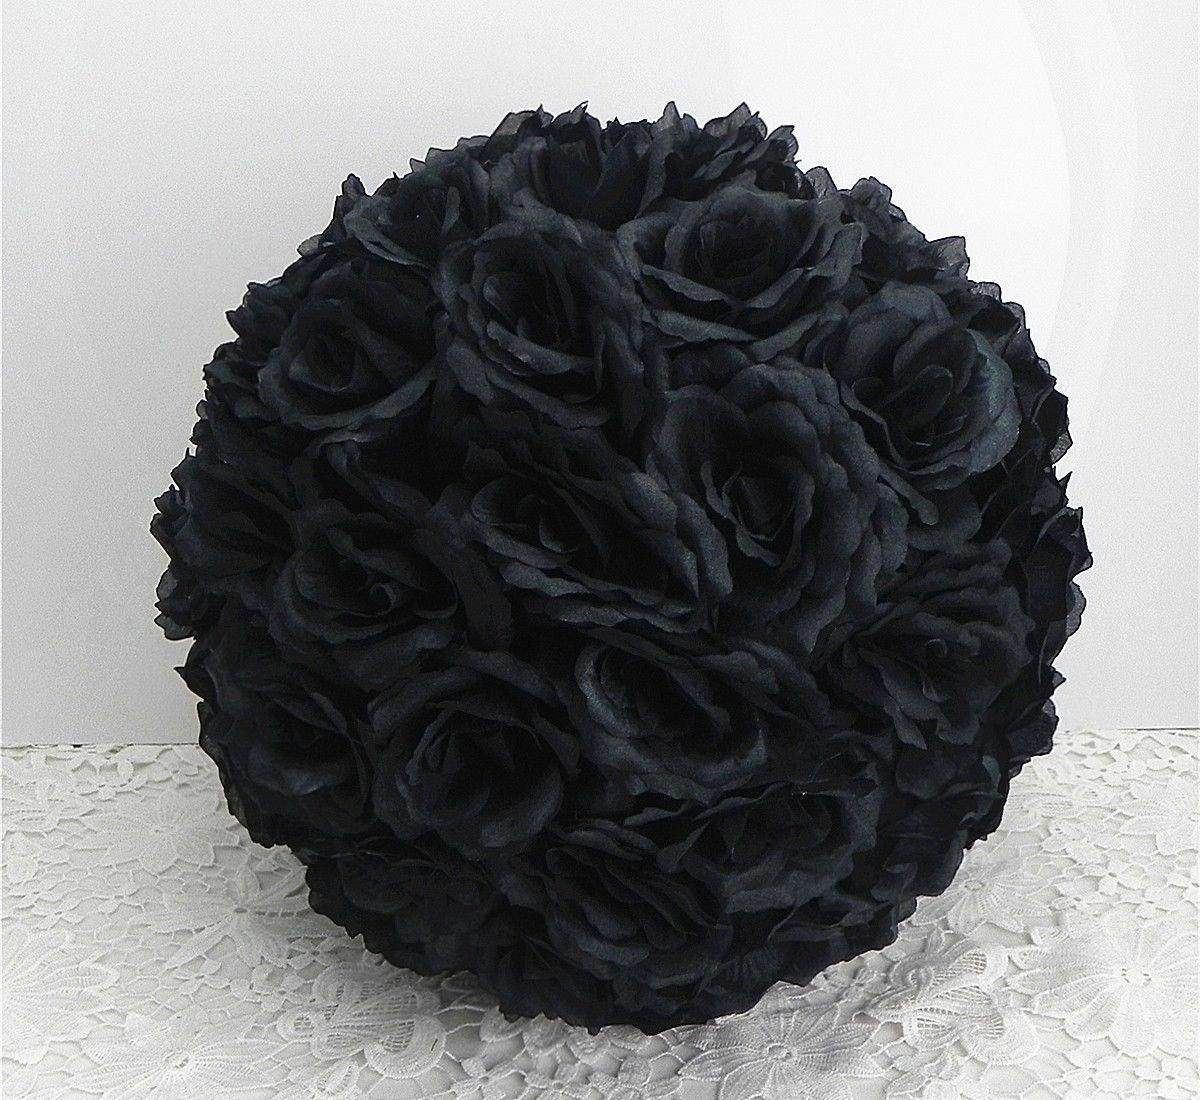 DIY-25-Colors-Rose-Pomander-Flower-Kissing-Ball-Parts-Wedding-Home-Decoration-Black-ball-parts-15cm-59